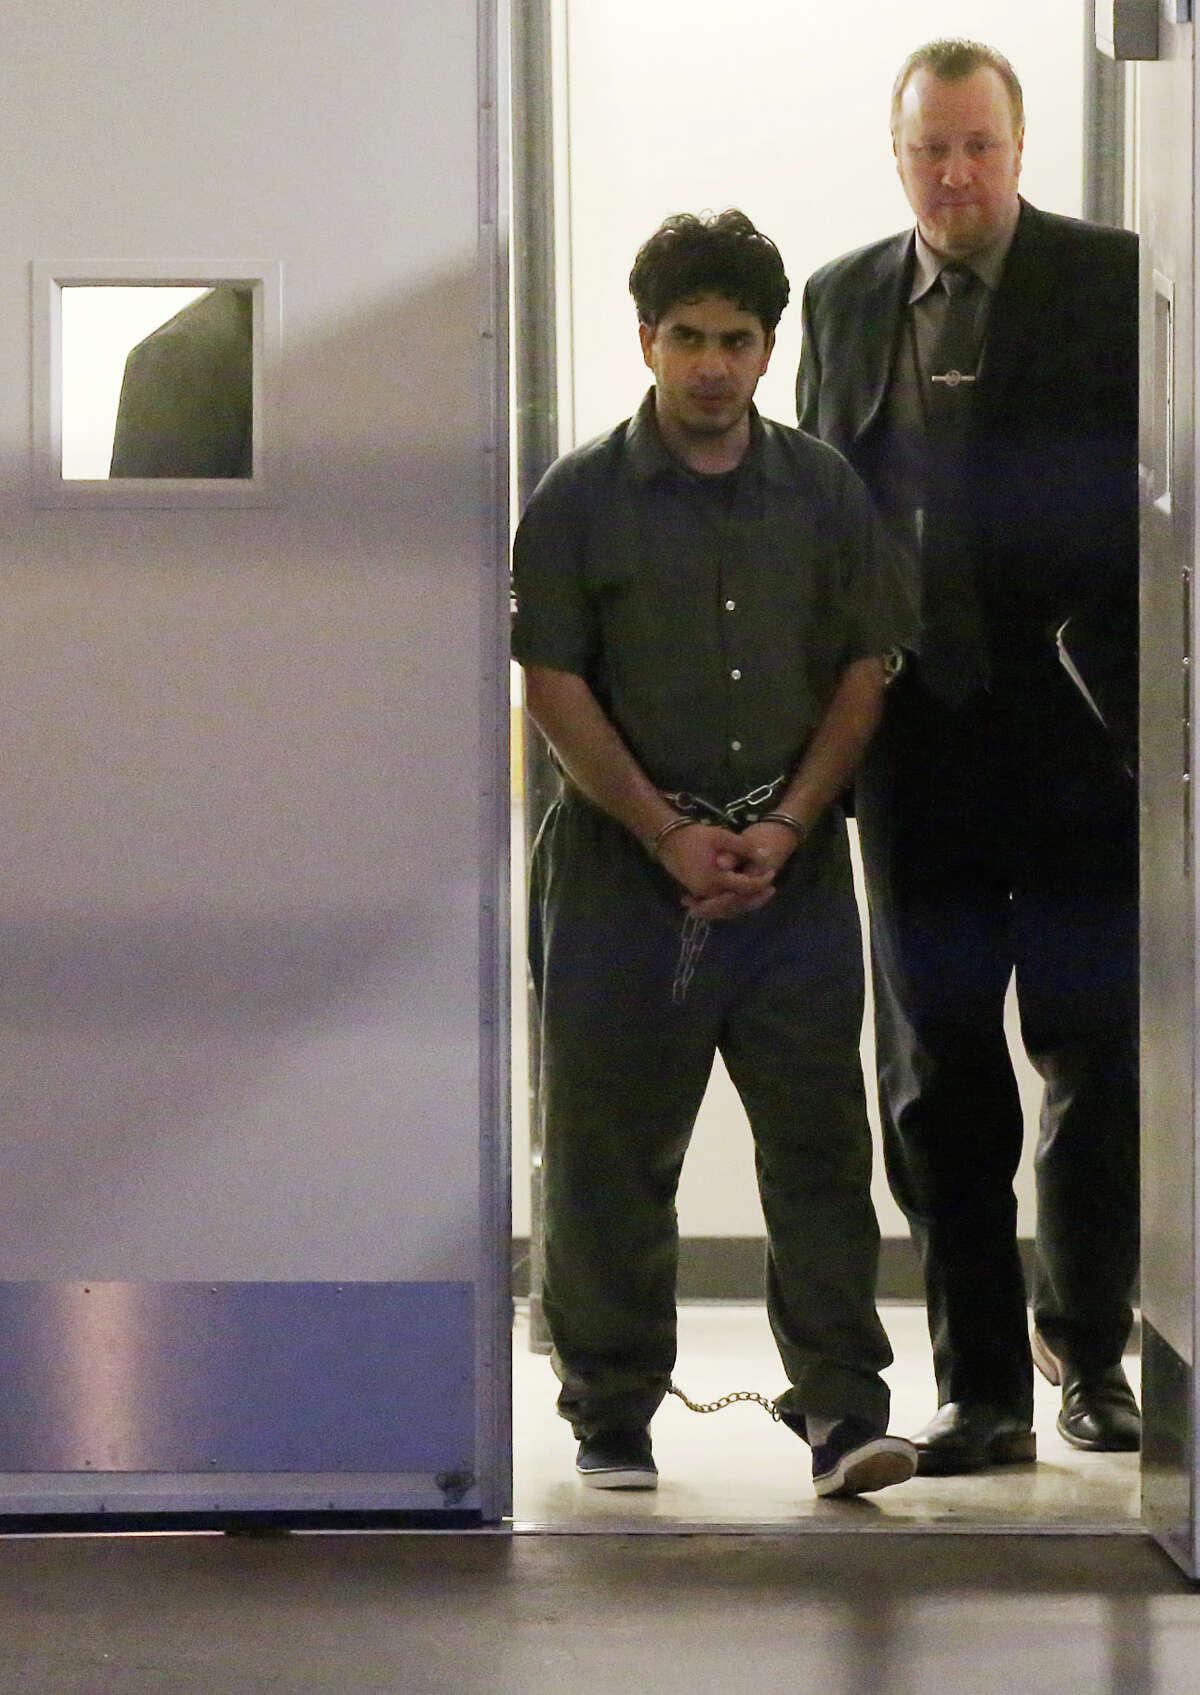 Omar Faraj Saeed Al Hardan is escorted out of the Bob Casey United States Courthouse by U.S. Marshalls Wednesday, Jan. 13, 2016, in Houston. ( Jon Shapley / Houston Chronicle )